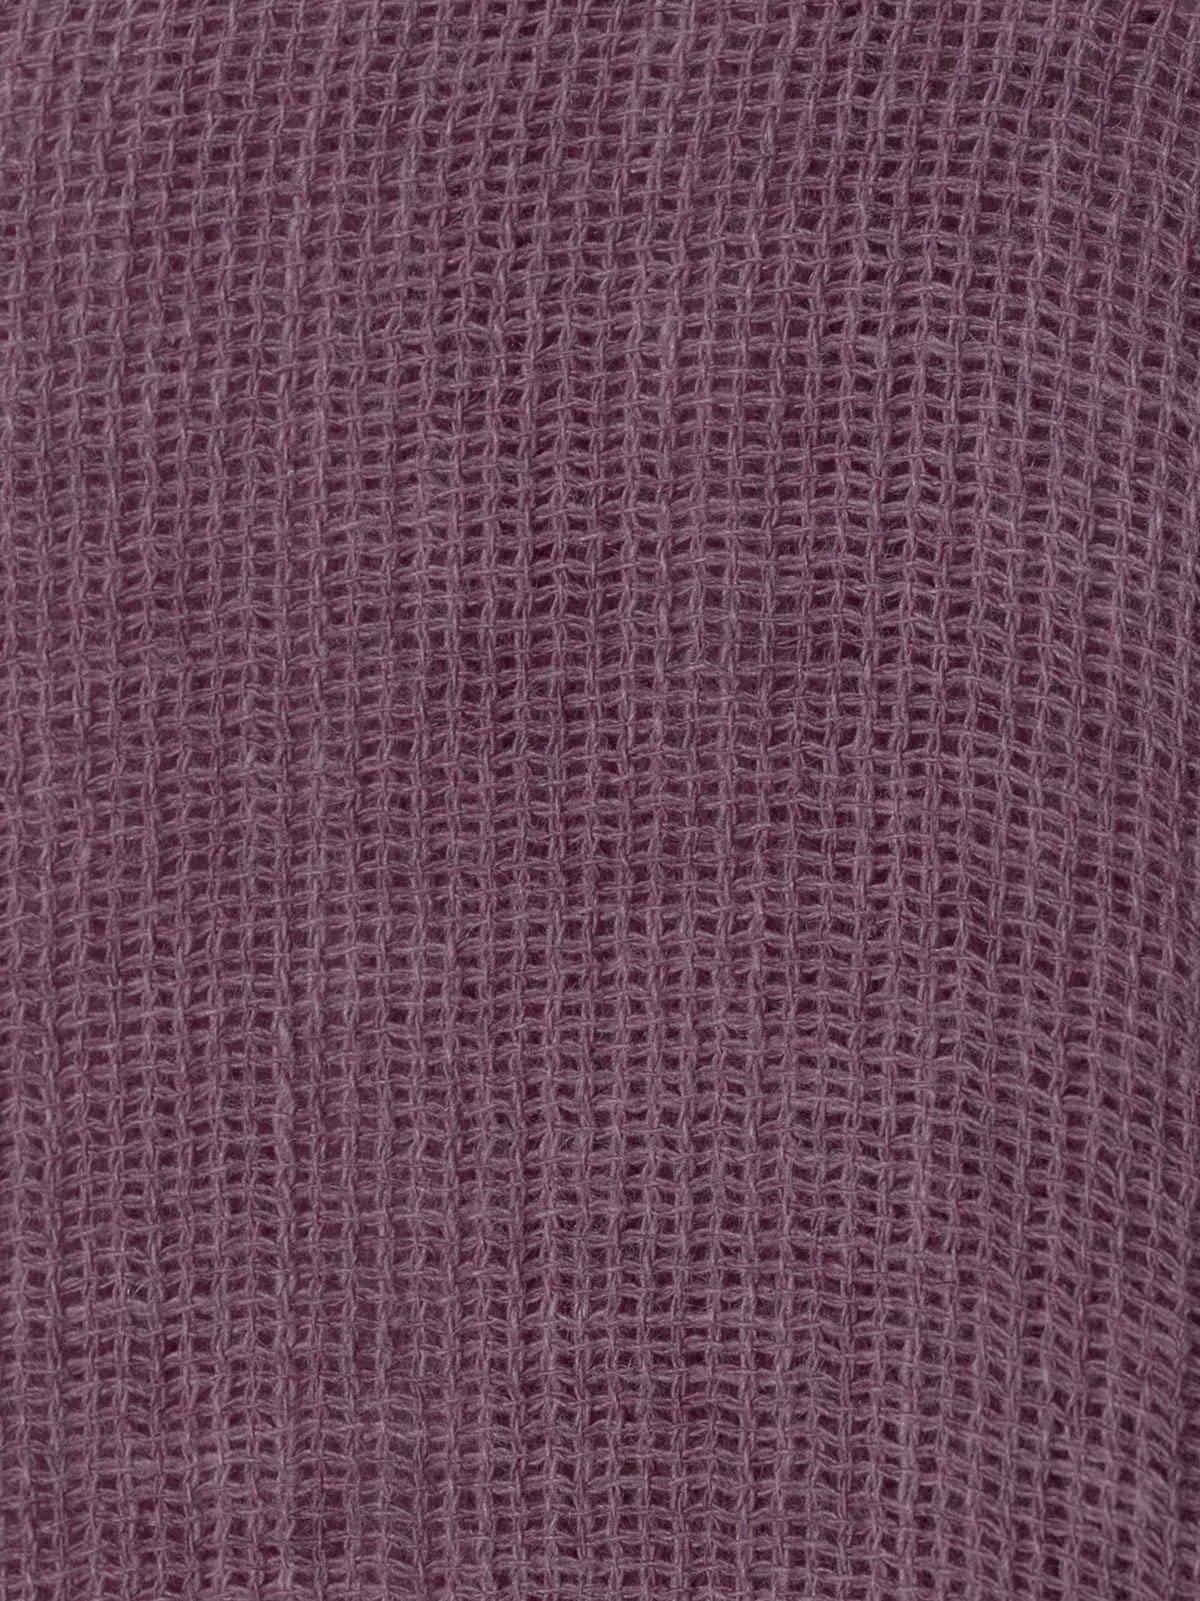 Chaqueta mujer oversize algodón lino Malva